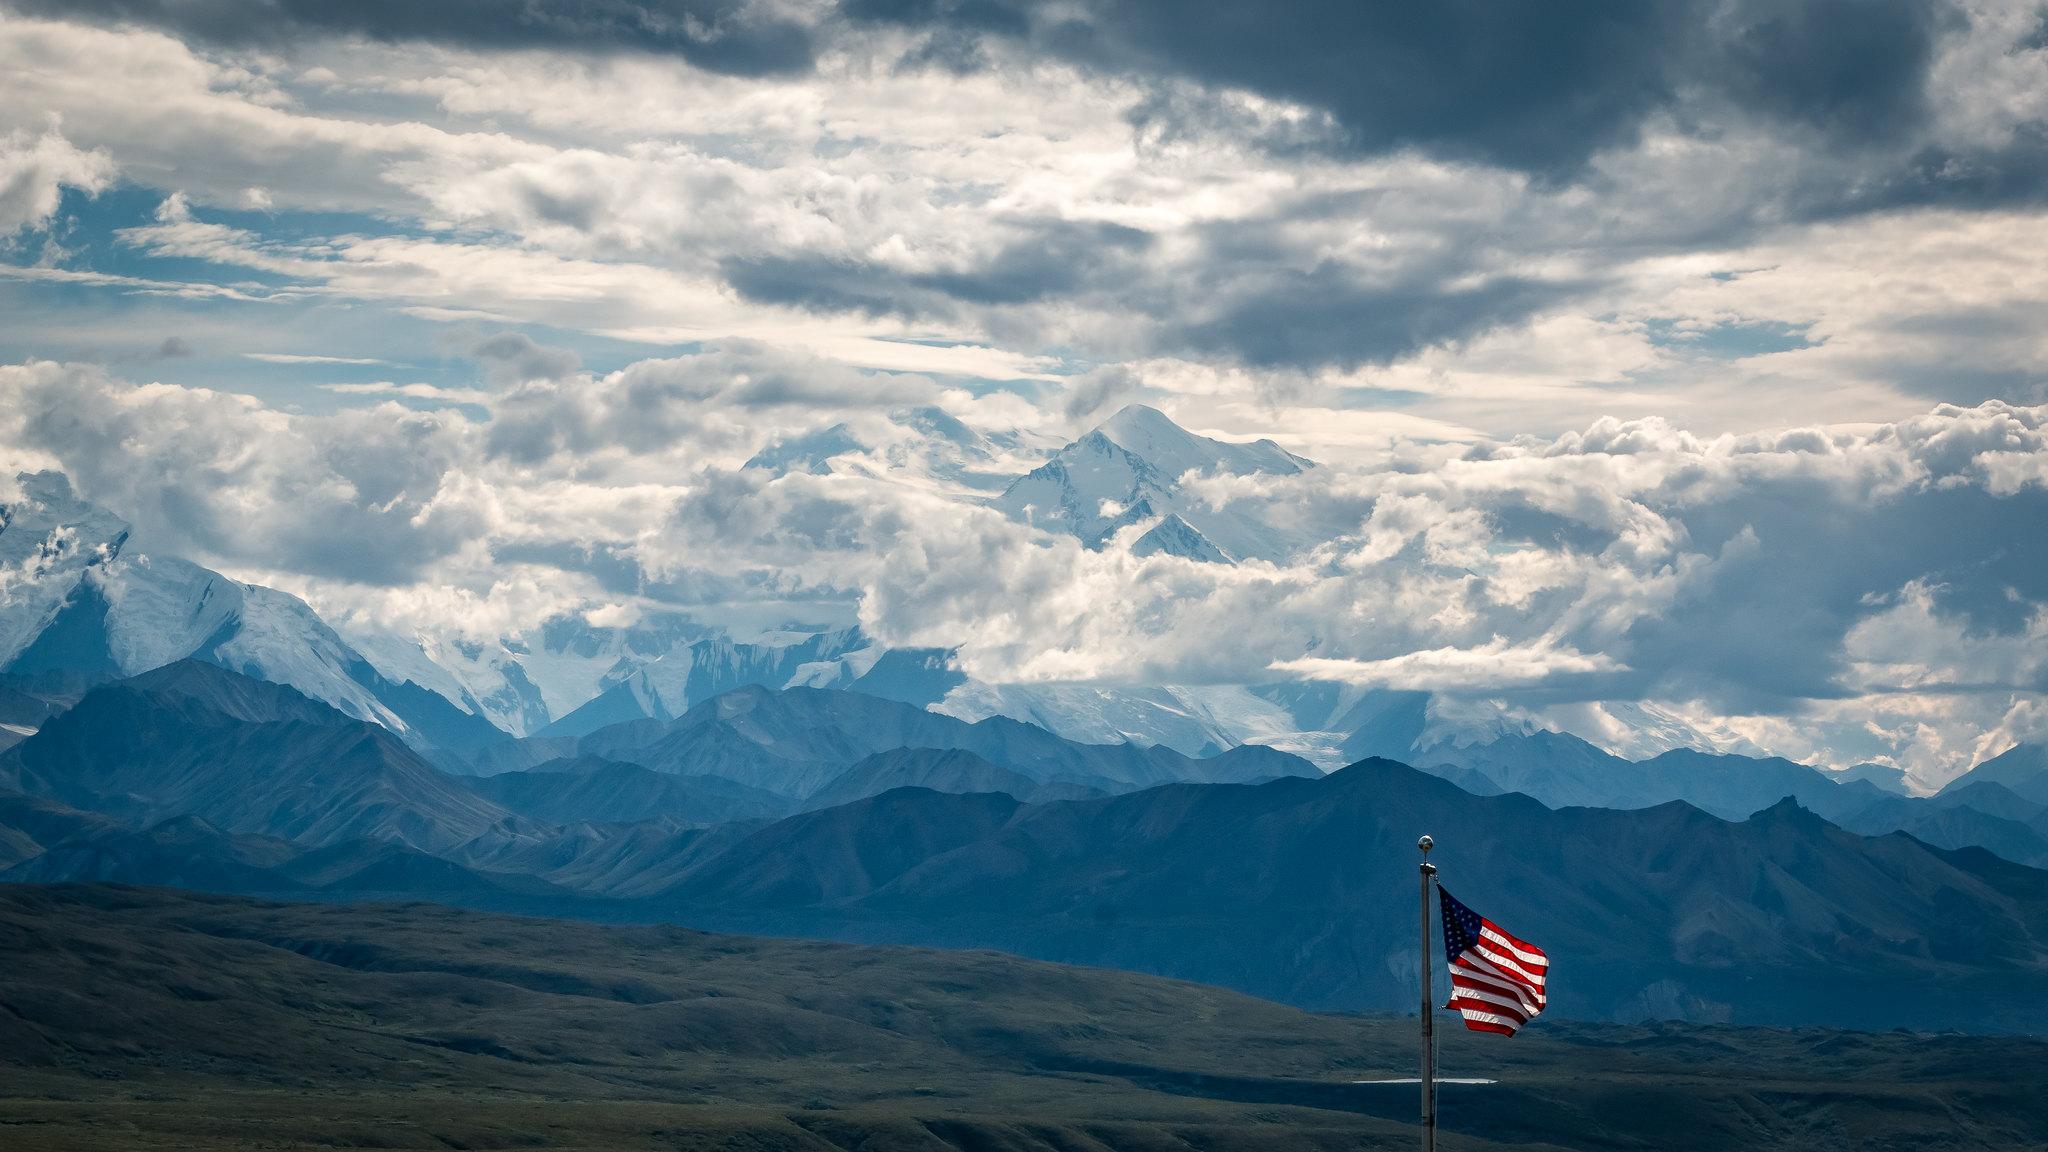 Denali - Alaska - [USA]